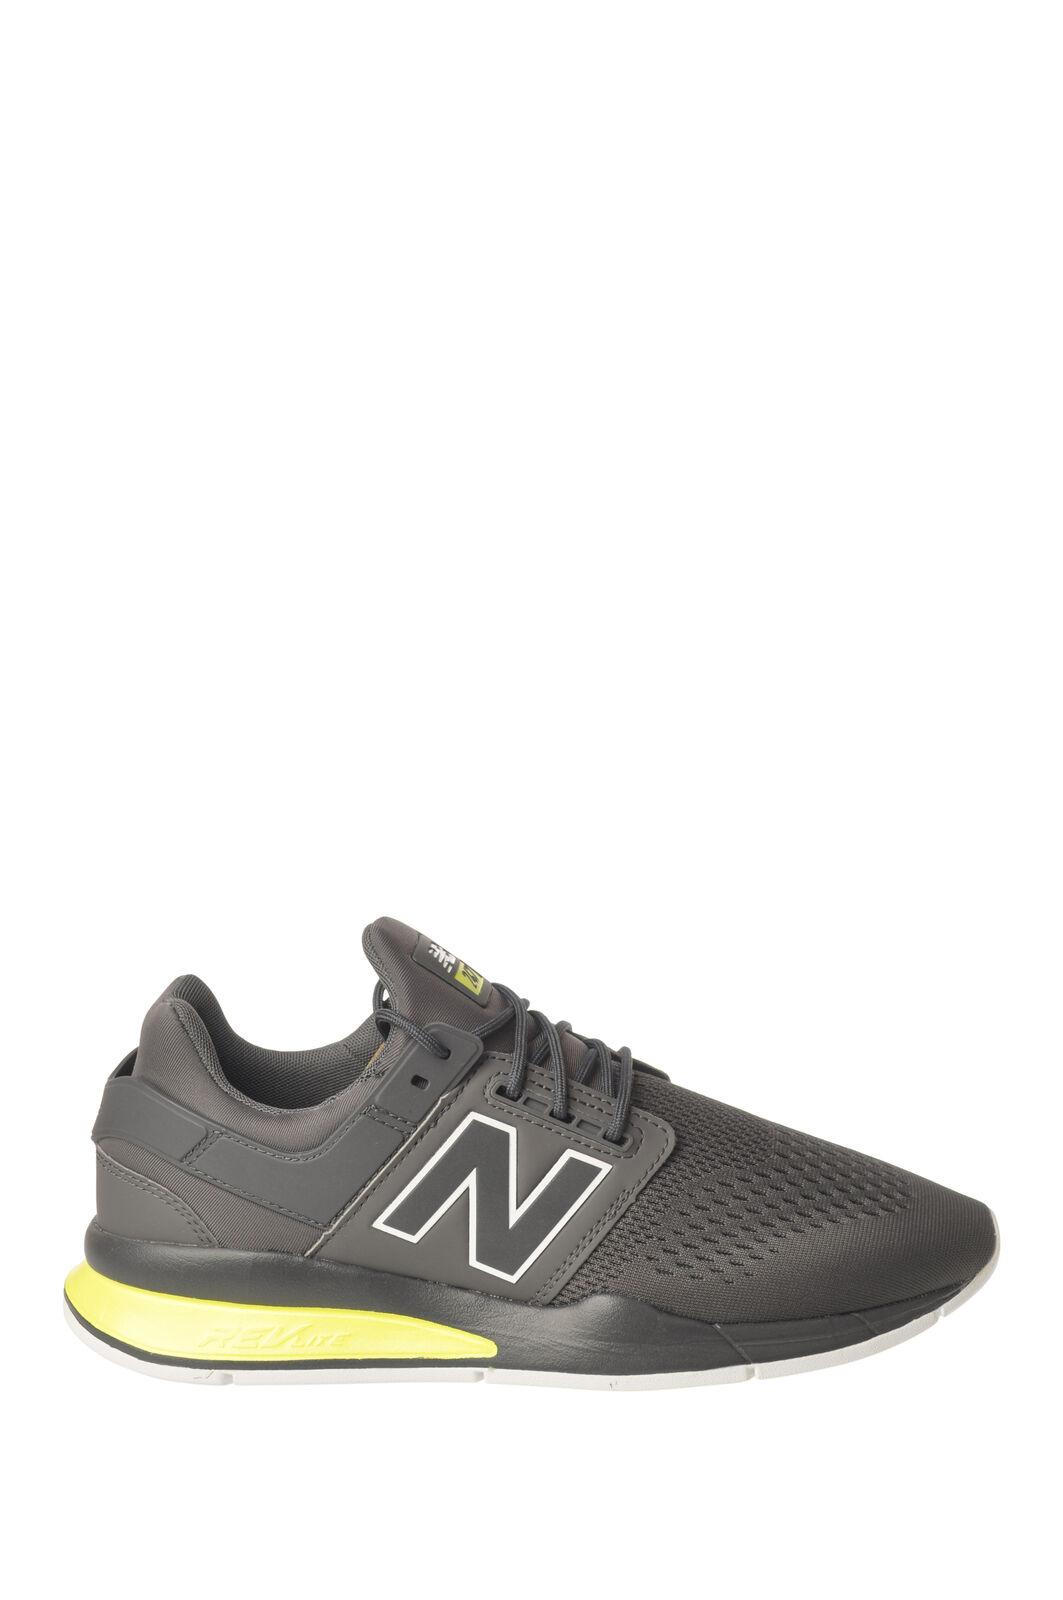 New Balance - zapatos-Lace Up - Man - gris - 5773801F190845